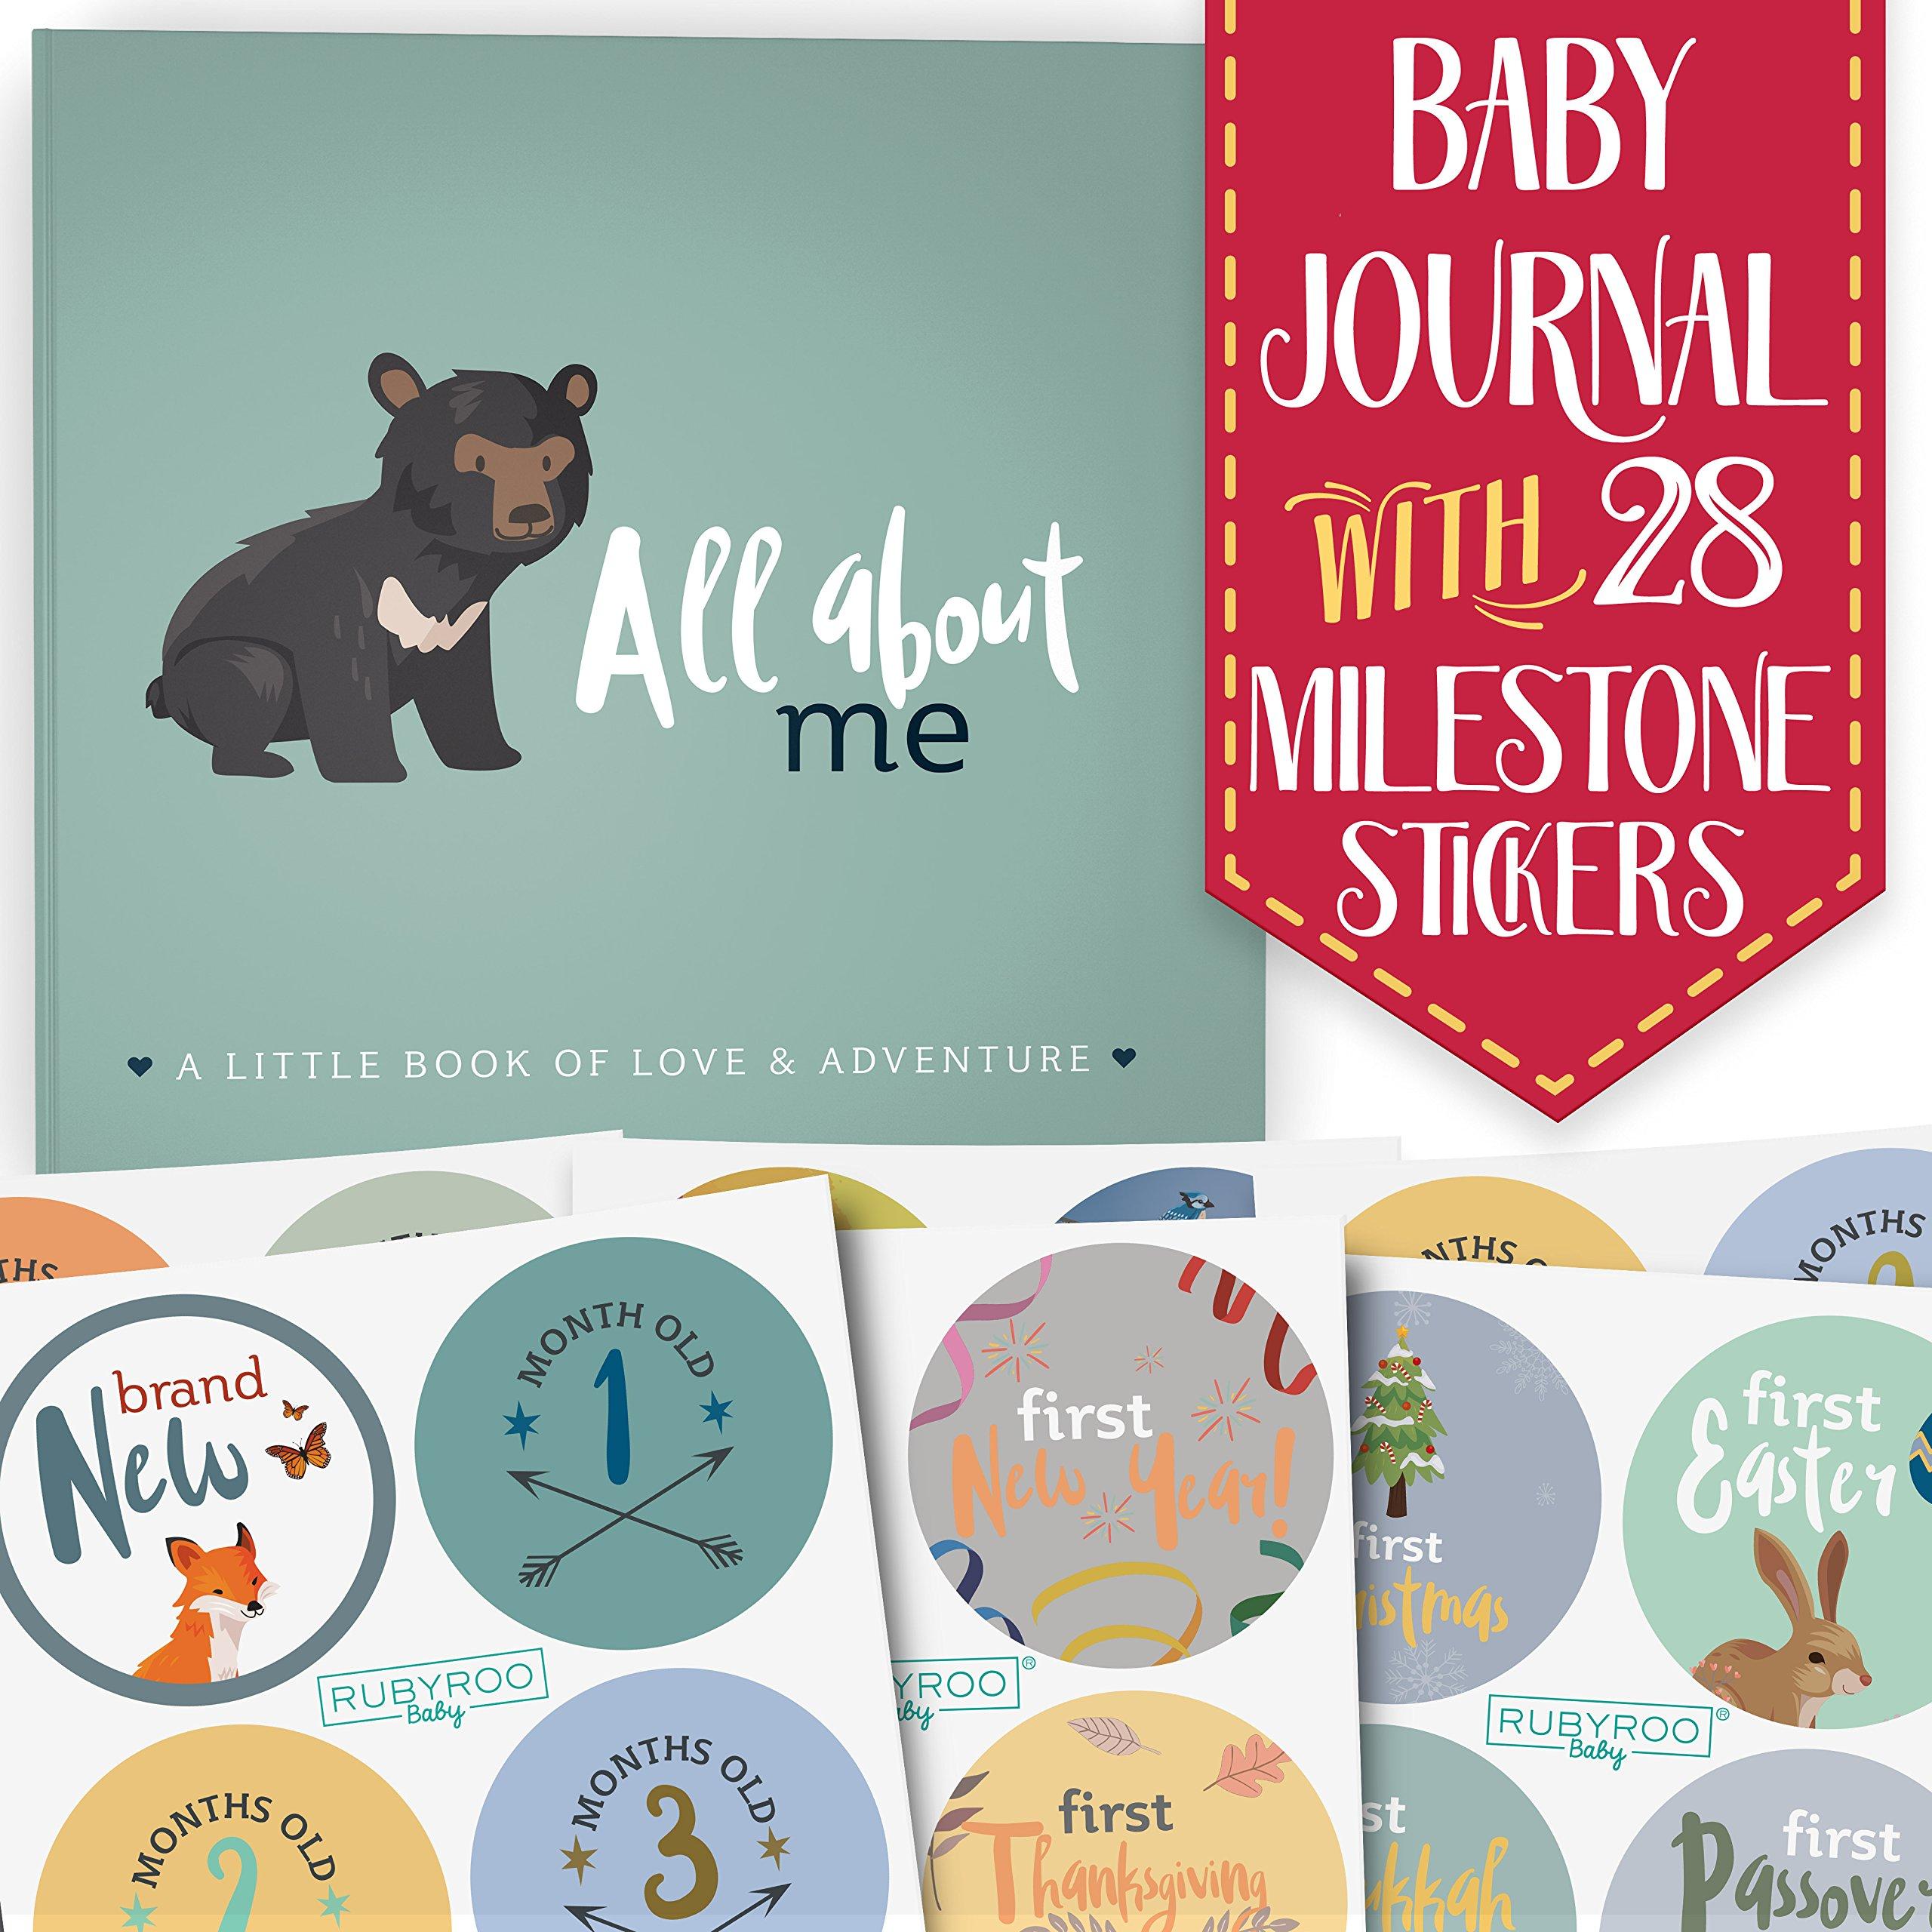 First Year Baby Memory Journal Book + Bonus Monthly Milestone Stickers. Baby Shower Gift + Keepsake to Record Photos + milestones. Five Year Scrapbook + Picture Album. Boy + Girl Babies. (Woodland)